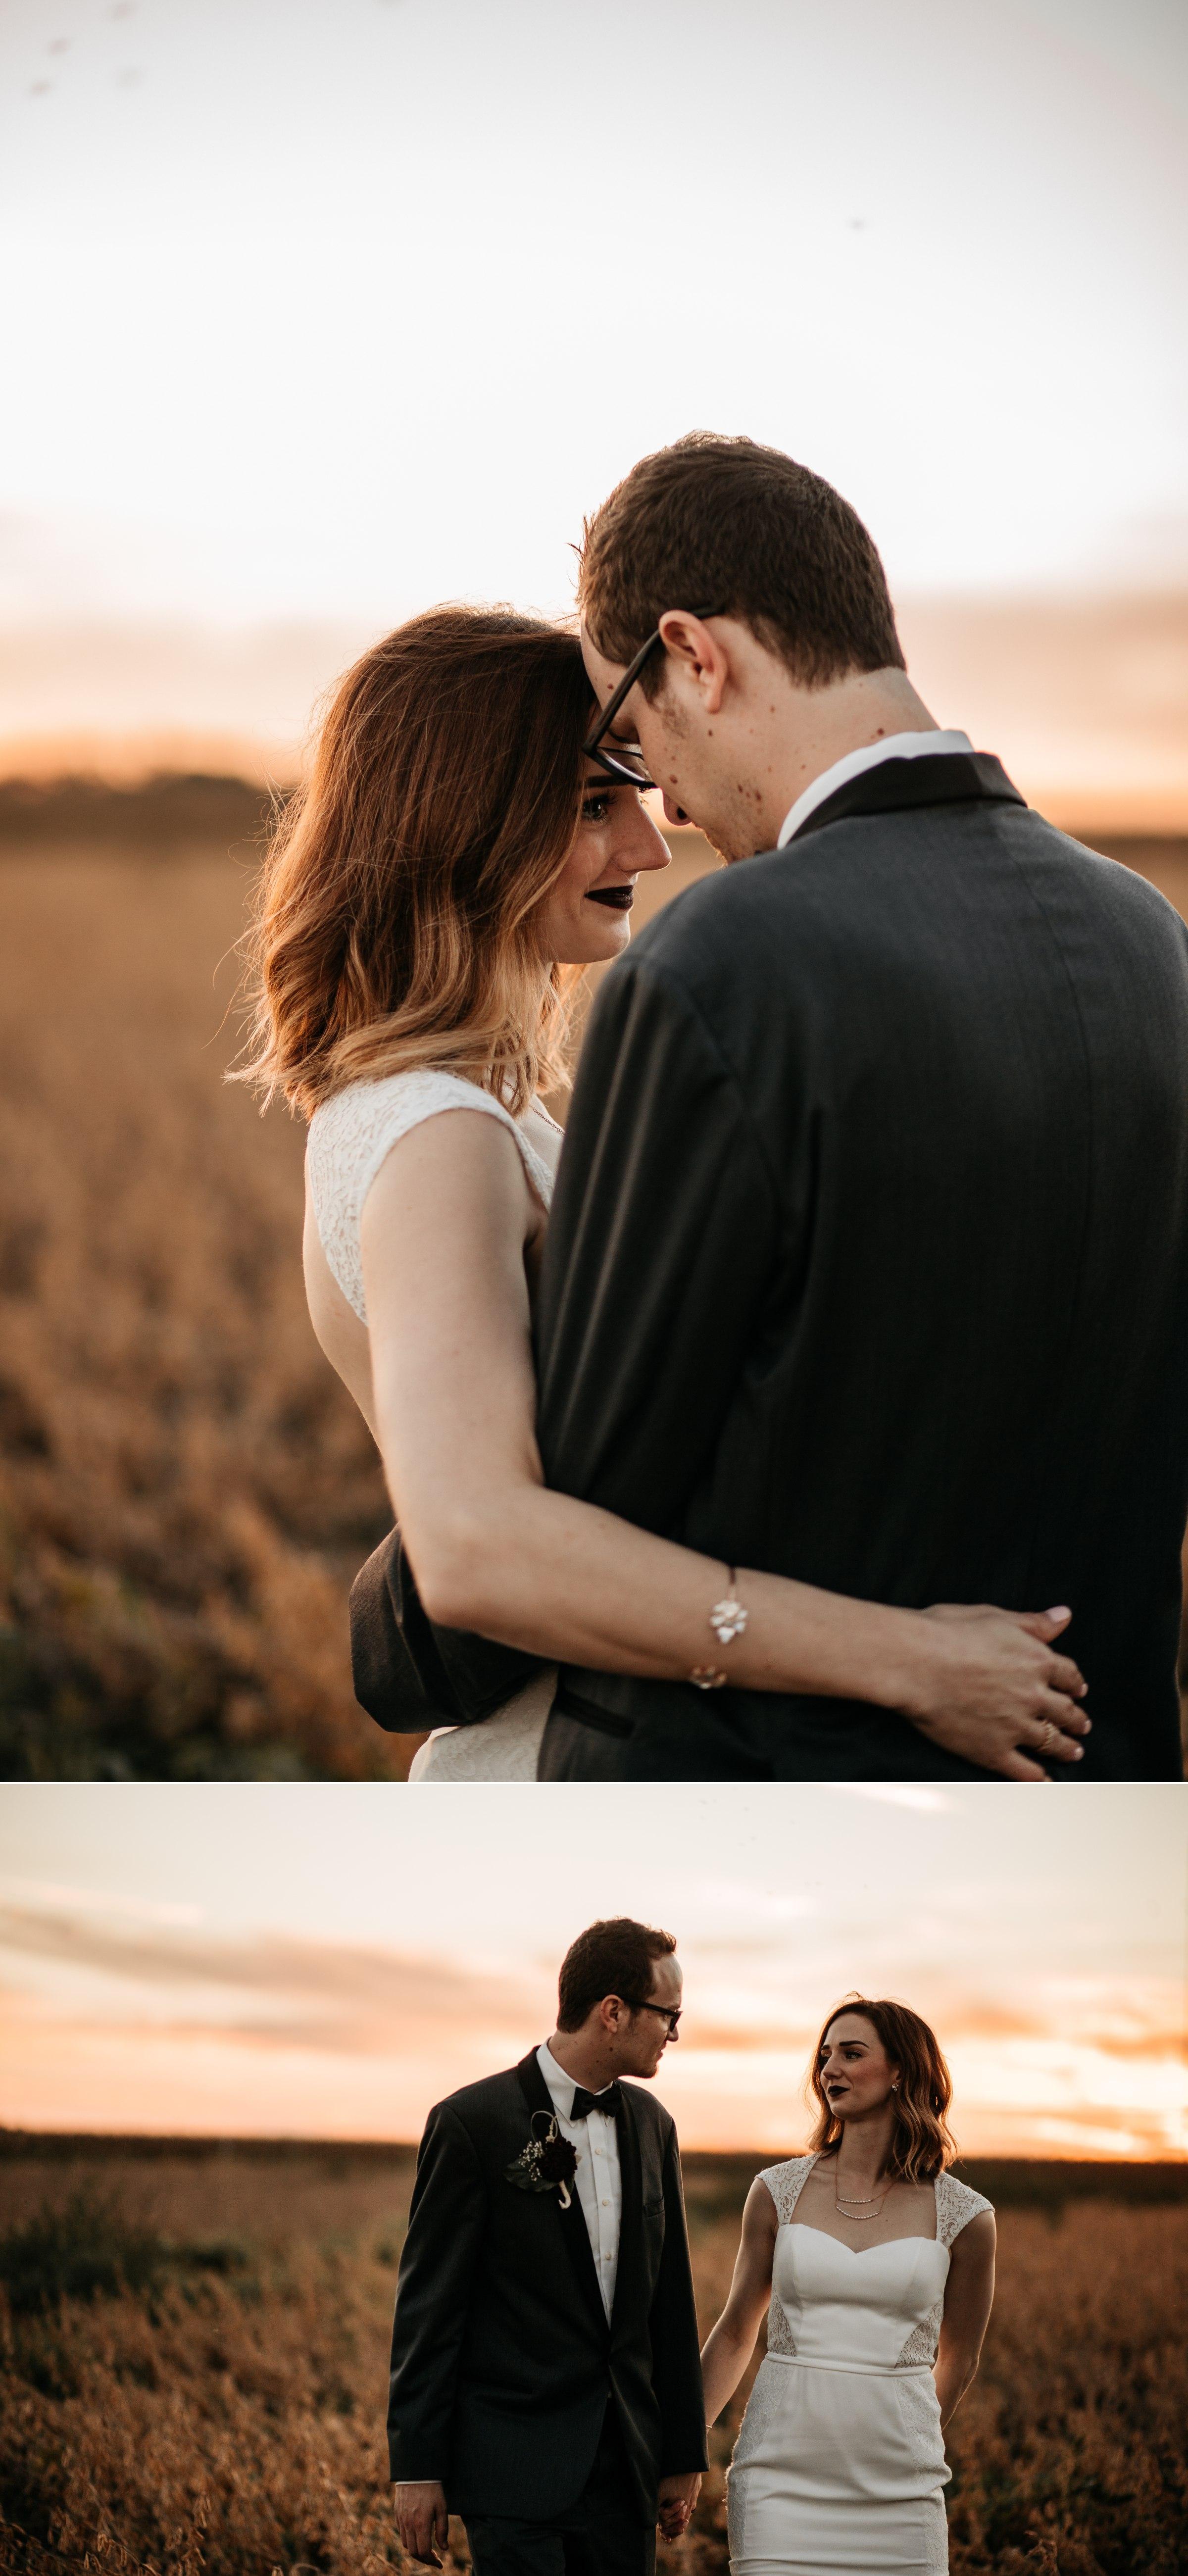 caroline and taylor minneapolis minnesota texas austin dallas houston wedding elopement destination intimate adventurous couple best photographer_0258.jpg